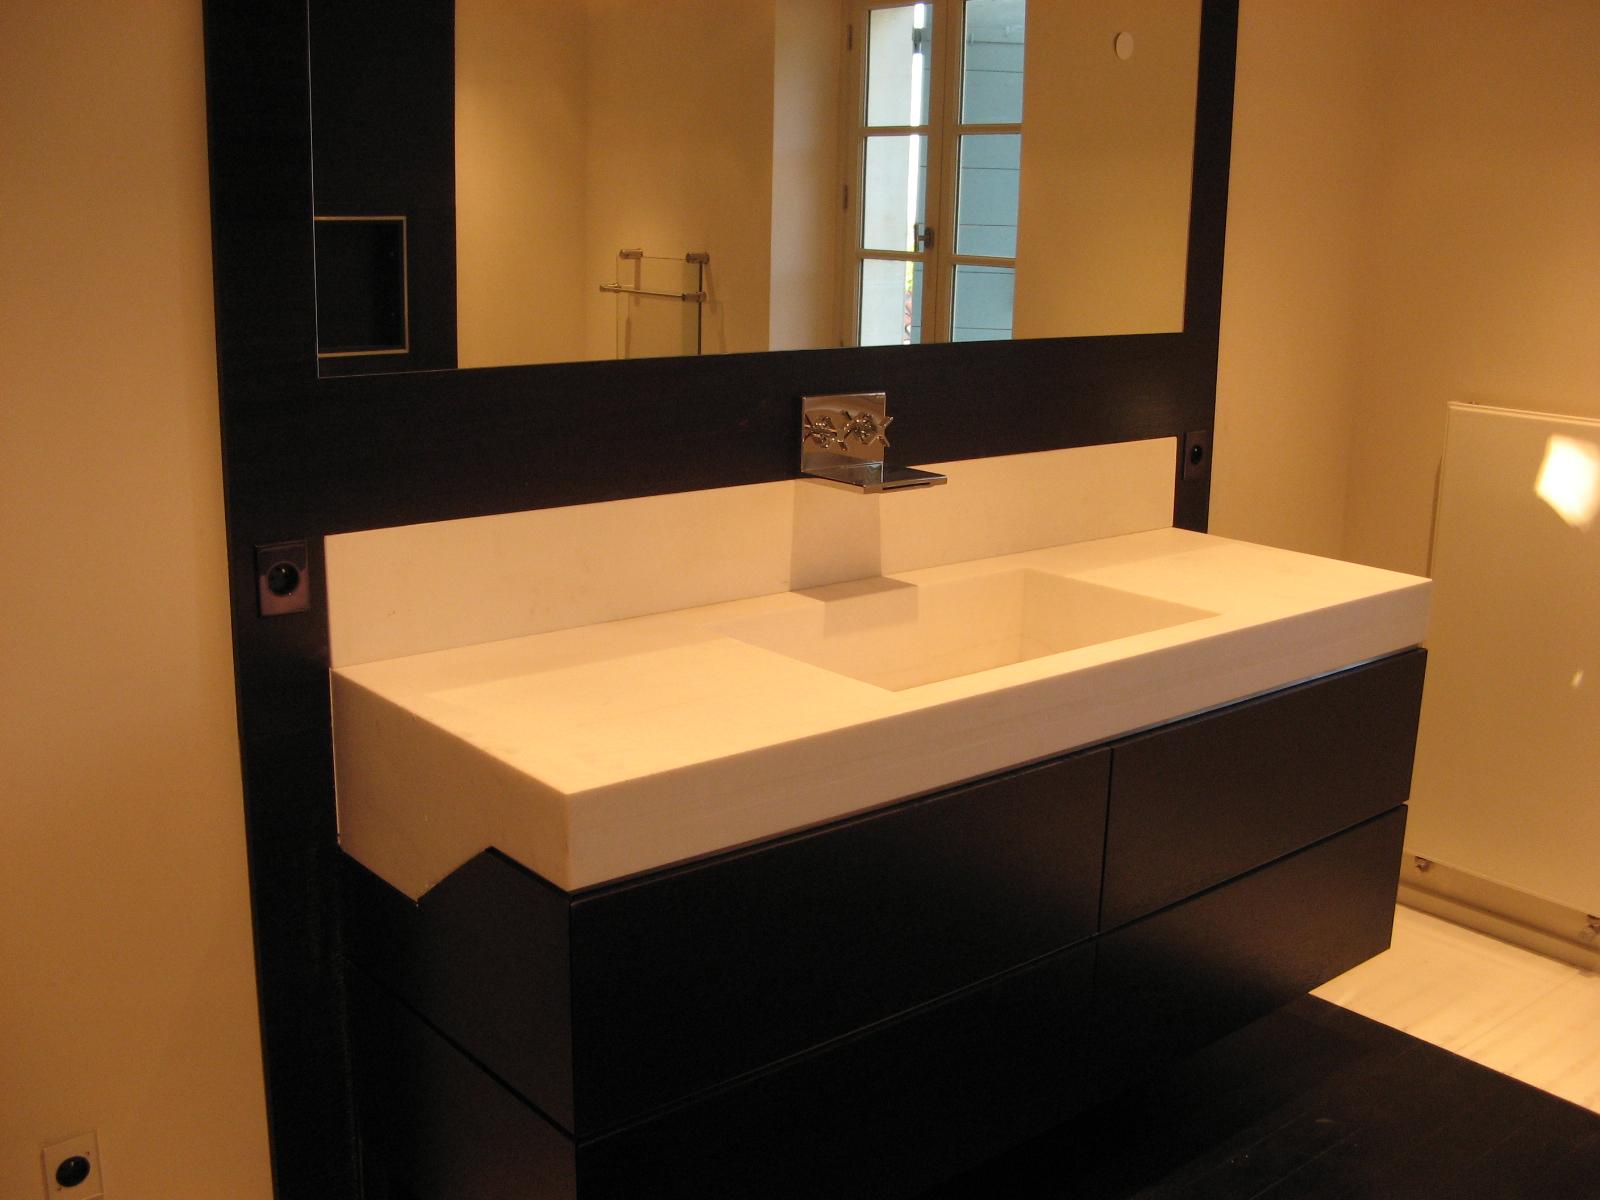 l 39 utilisation du marbre dans l 39 ameublement marbrerie proven ale. Black Bedroom Furniture Sets. Home Design Ideas